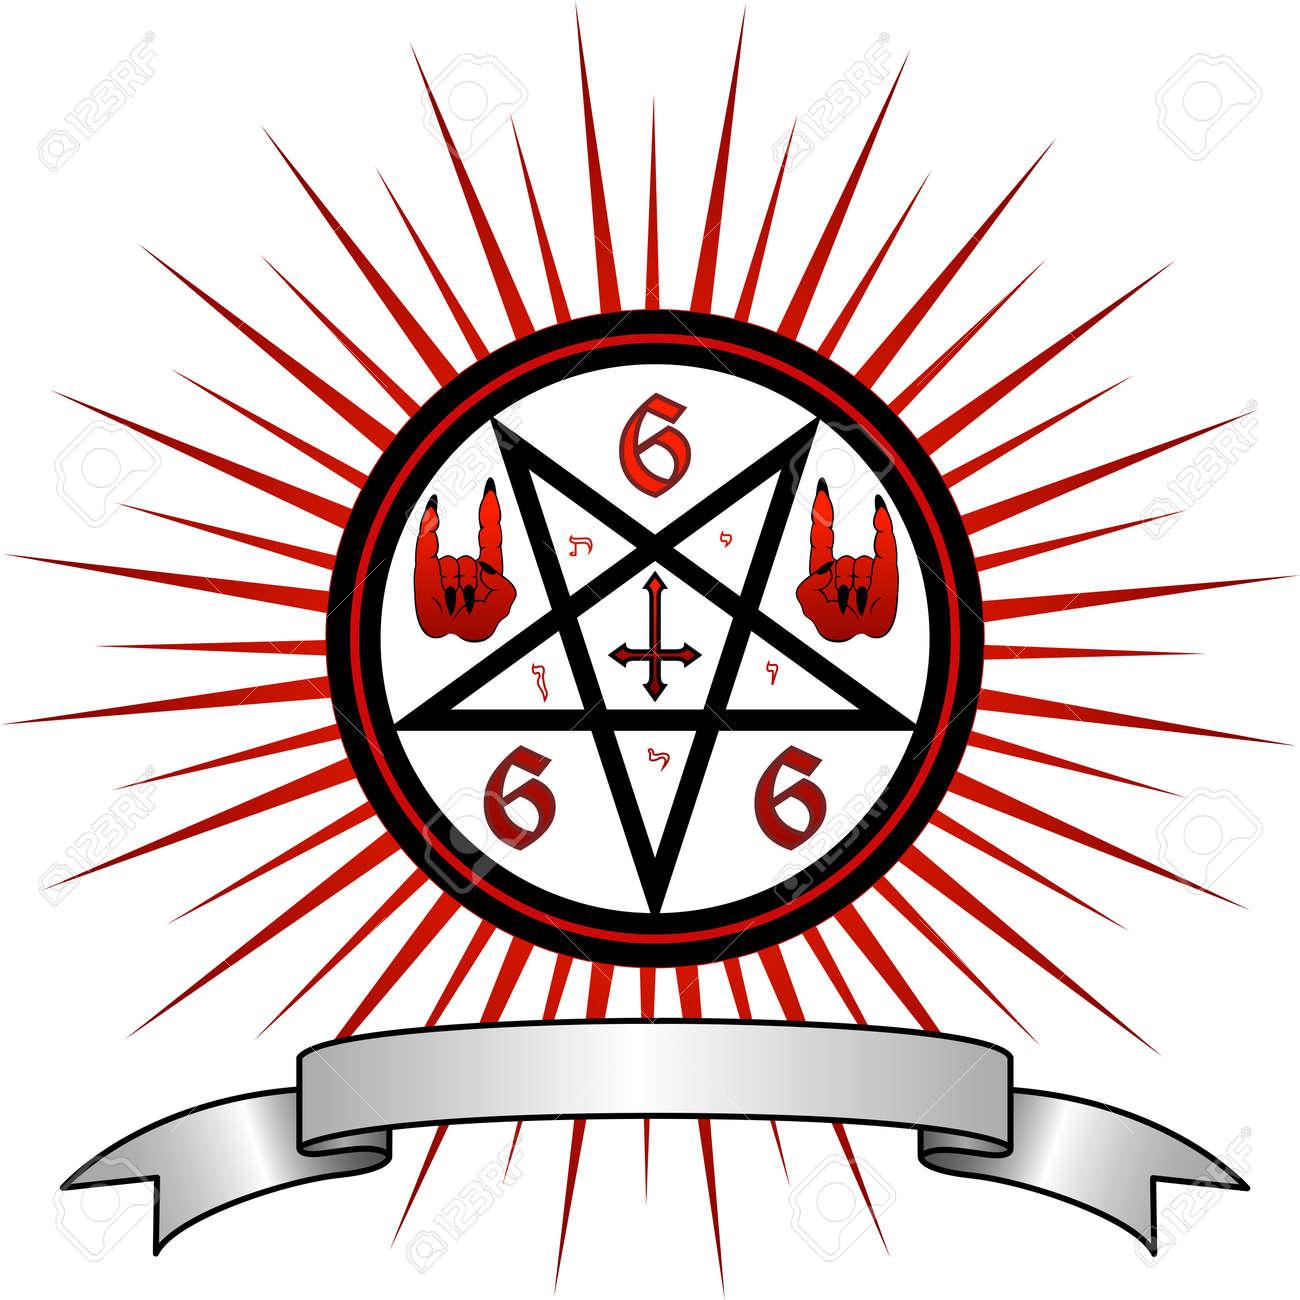 Pics of satanic symbols choice image symbol and sign ideas illustration full of magic and satanic symbols royalty free illustration full of magic and satanic symbols buycottarizona